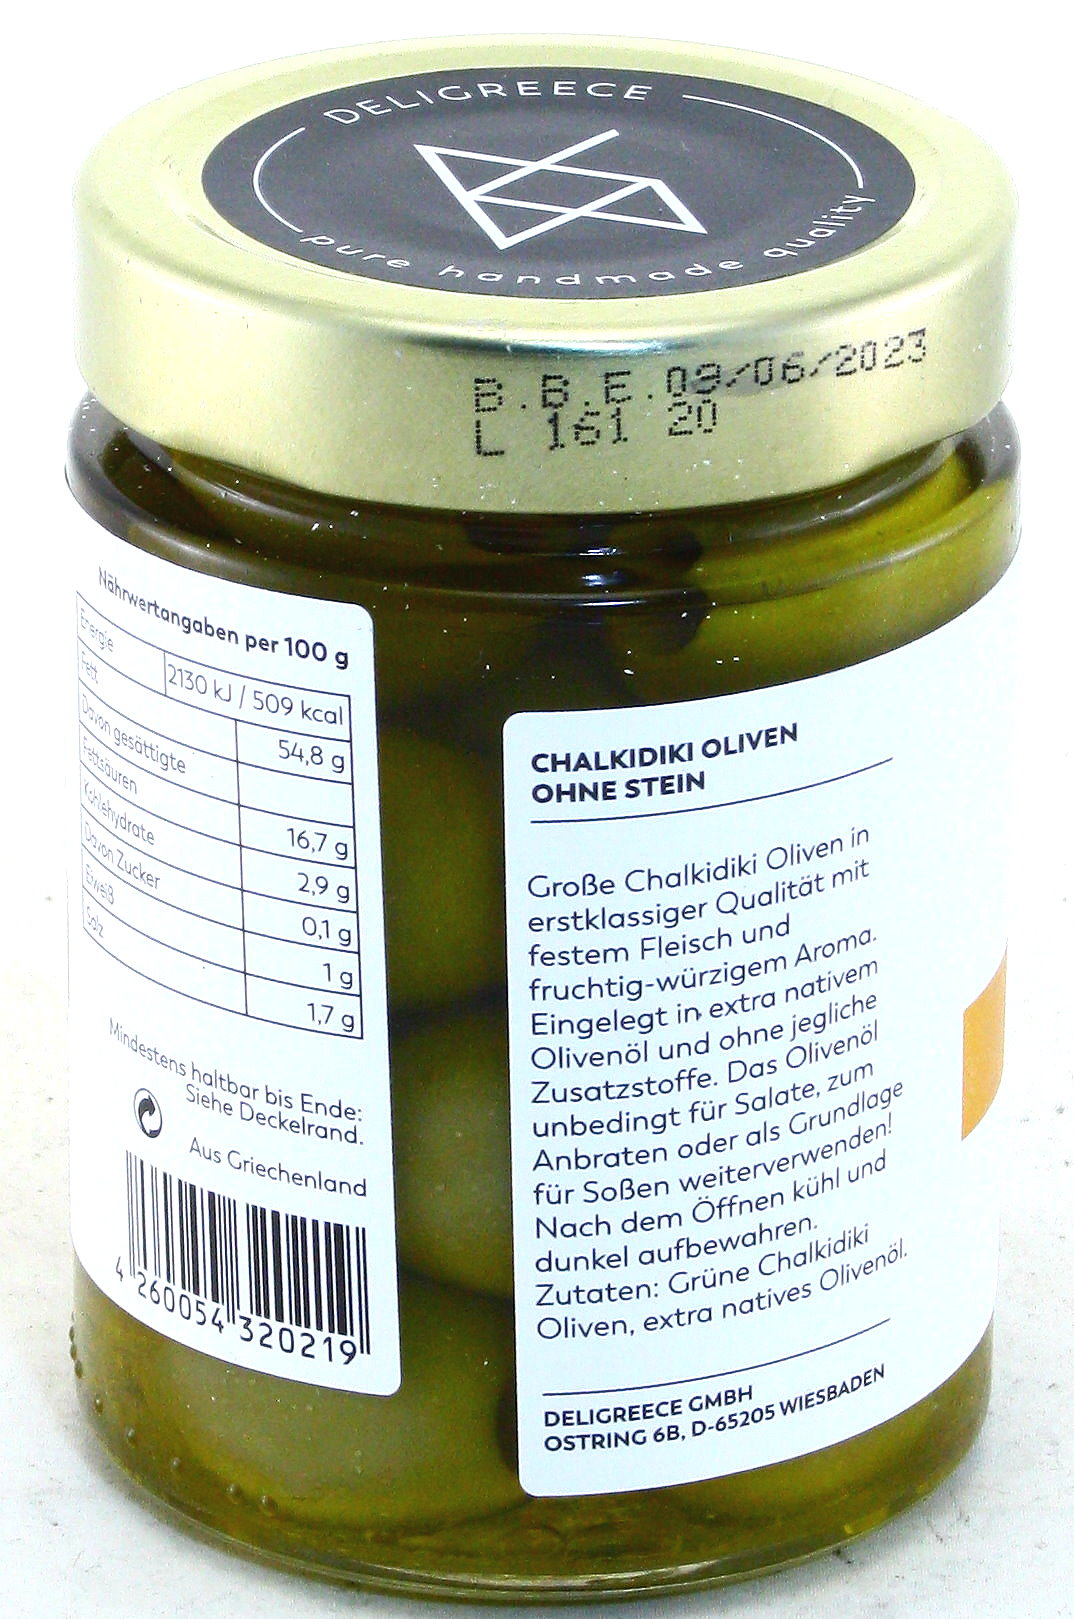 Premium Chalkidiki Oliven mit Feta-Käse - Oliven in extra nativem Olivenöl, ohne Stein